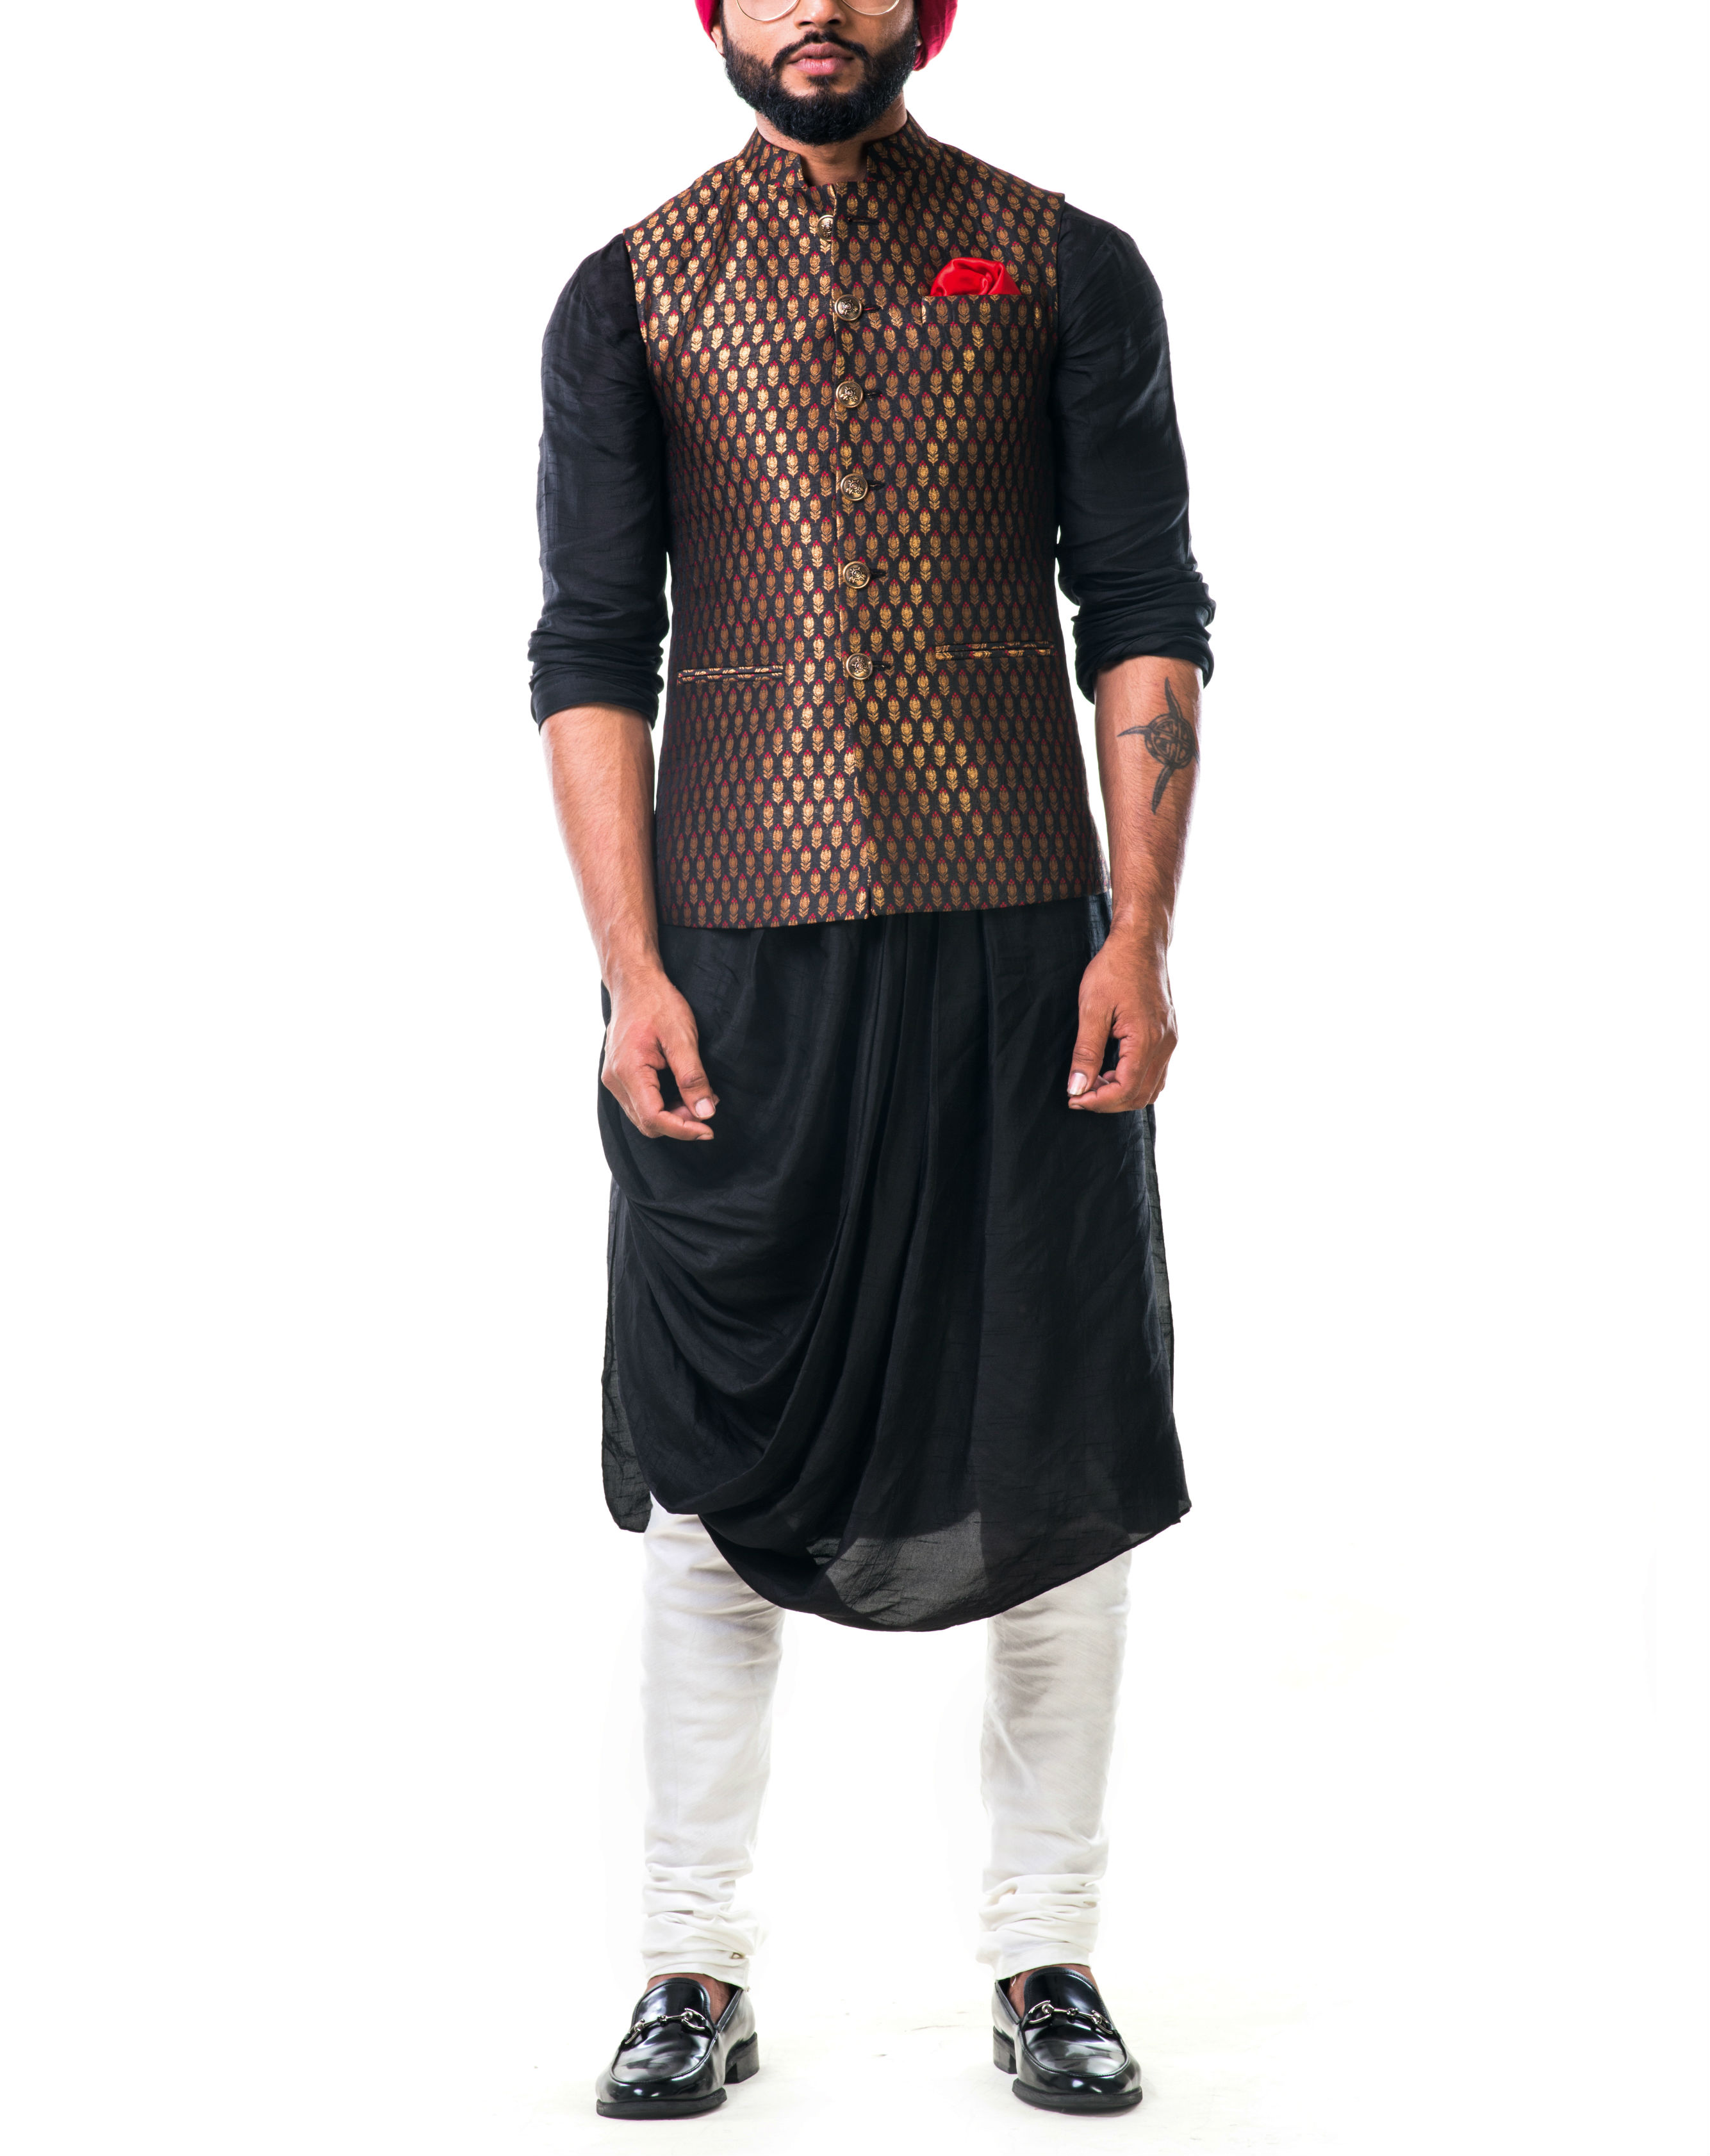 Black cowl kurta set with a black brocade nehru jacket with golden floral motifs